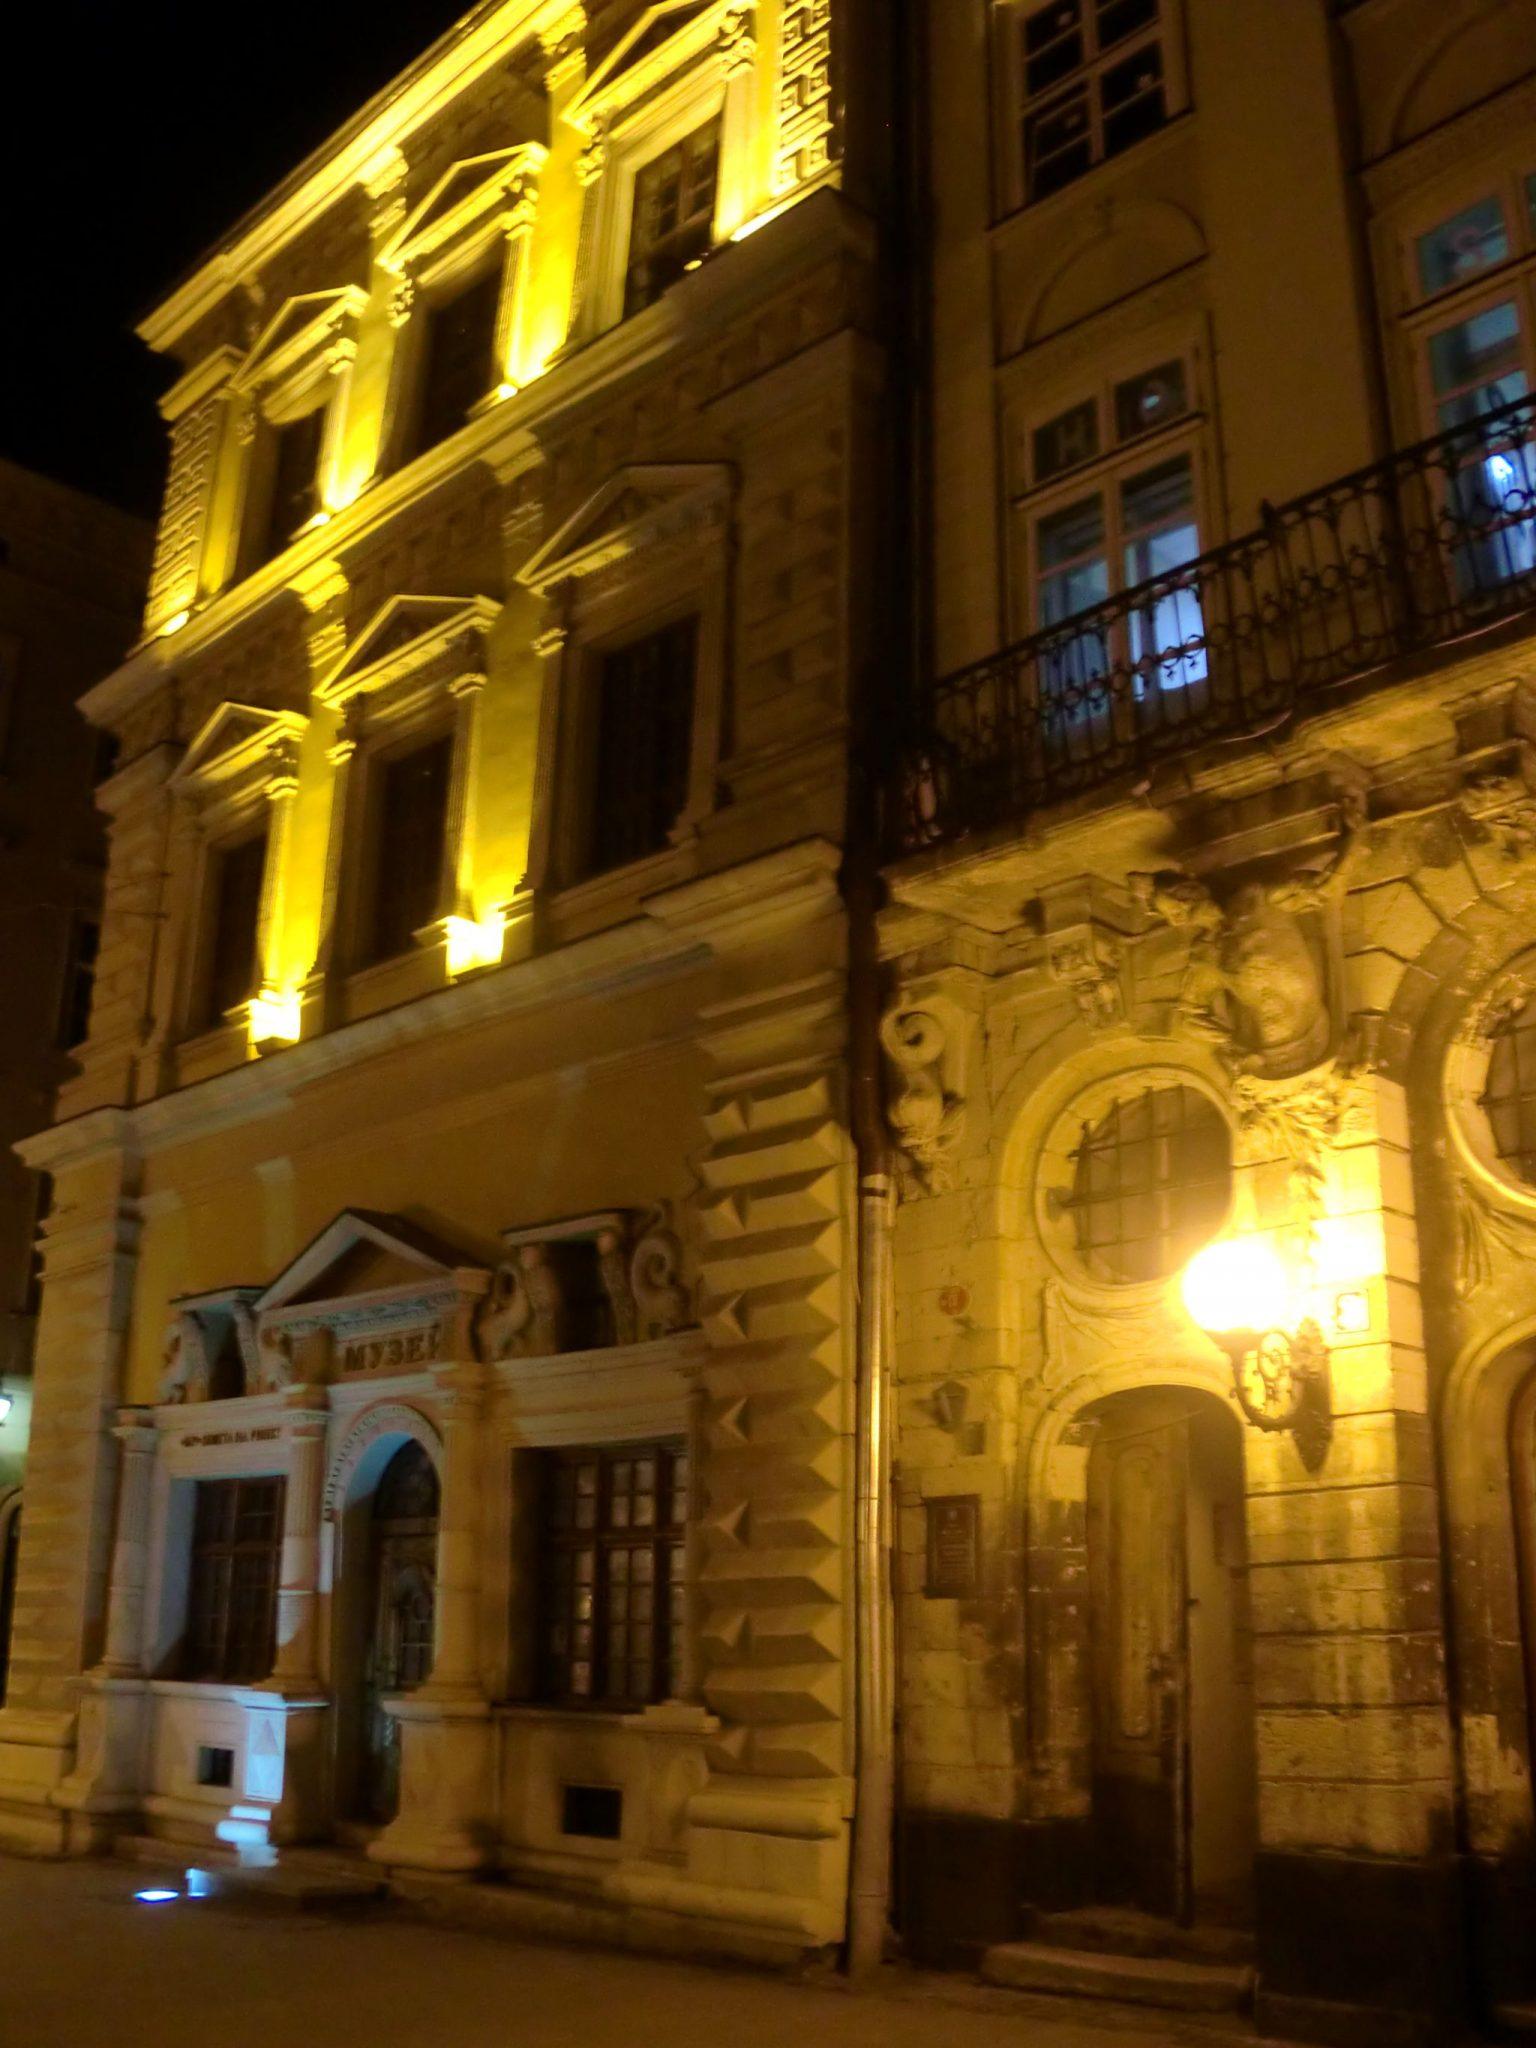 Lviv 8 - Lviv, the Ukrainian pearl